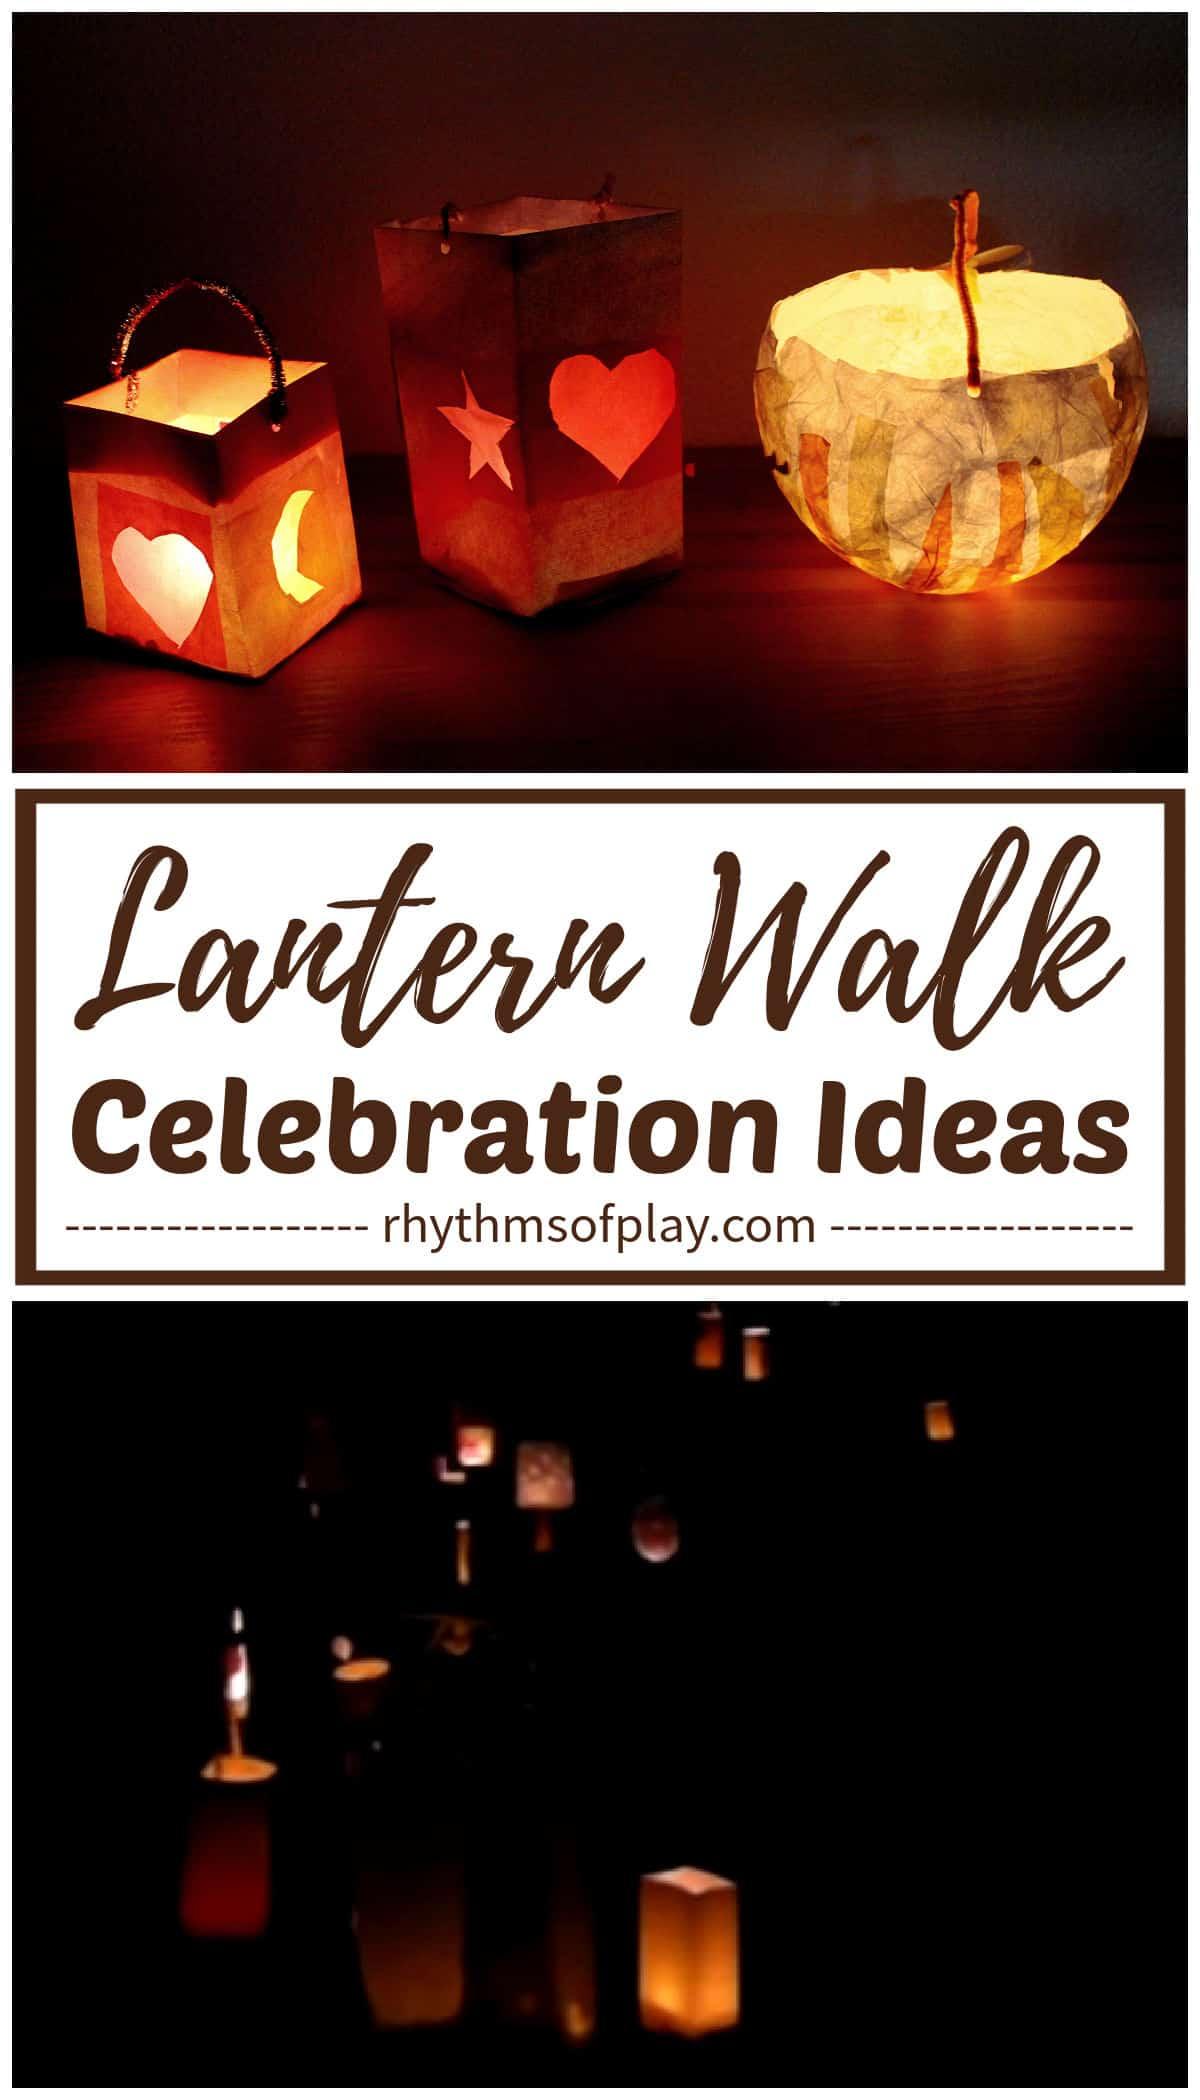 Lanterns for Waldorf Martinmas lantern walk festival